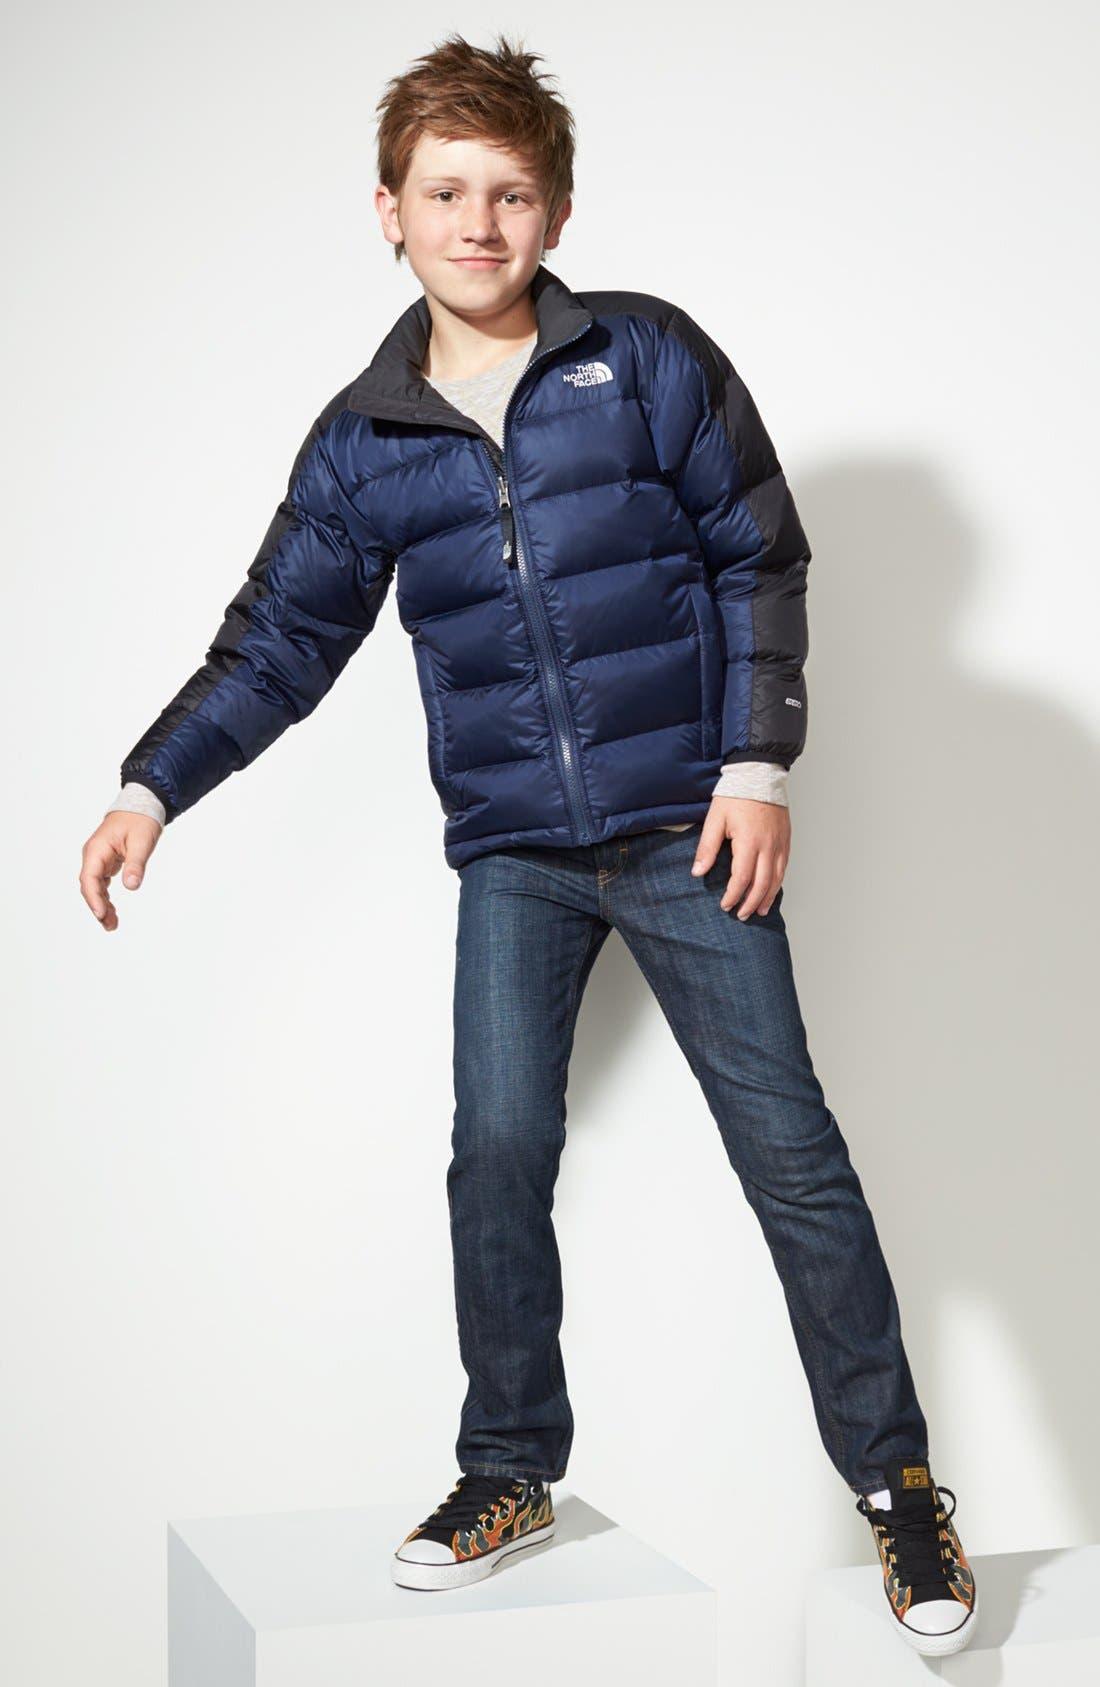 Main Image - The North Face Jacket, Tucker + Tate Shirt & Jeans (Big Boys)